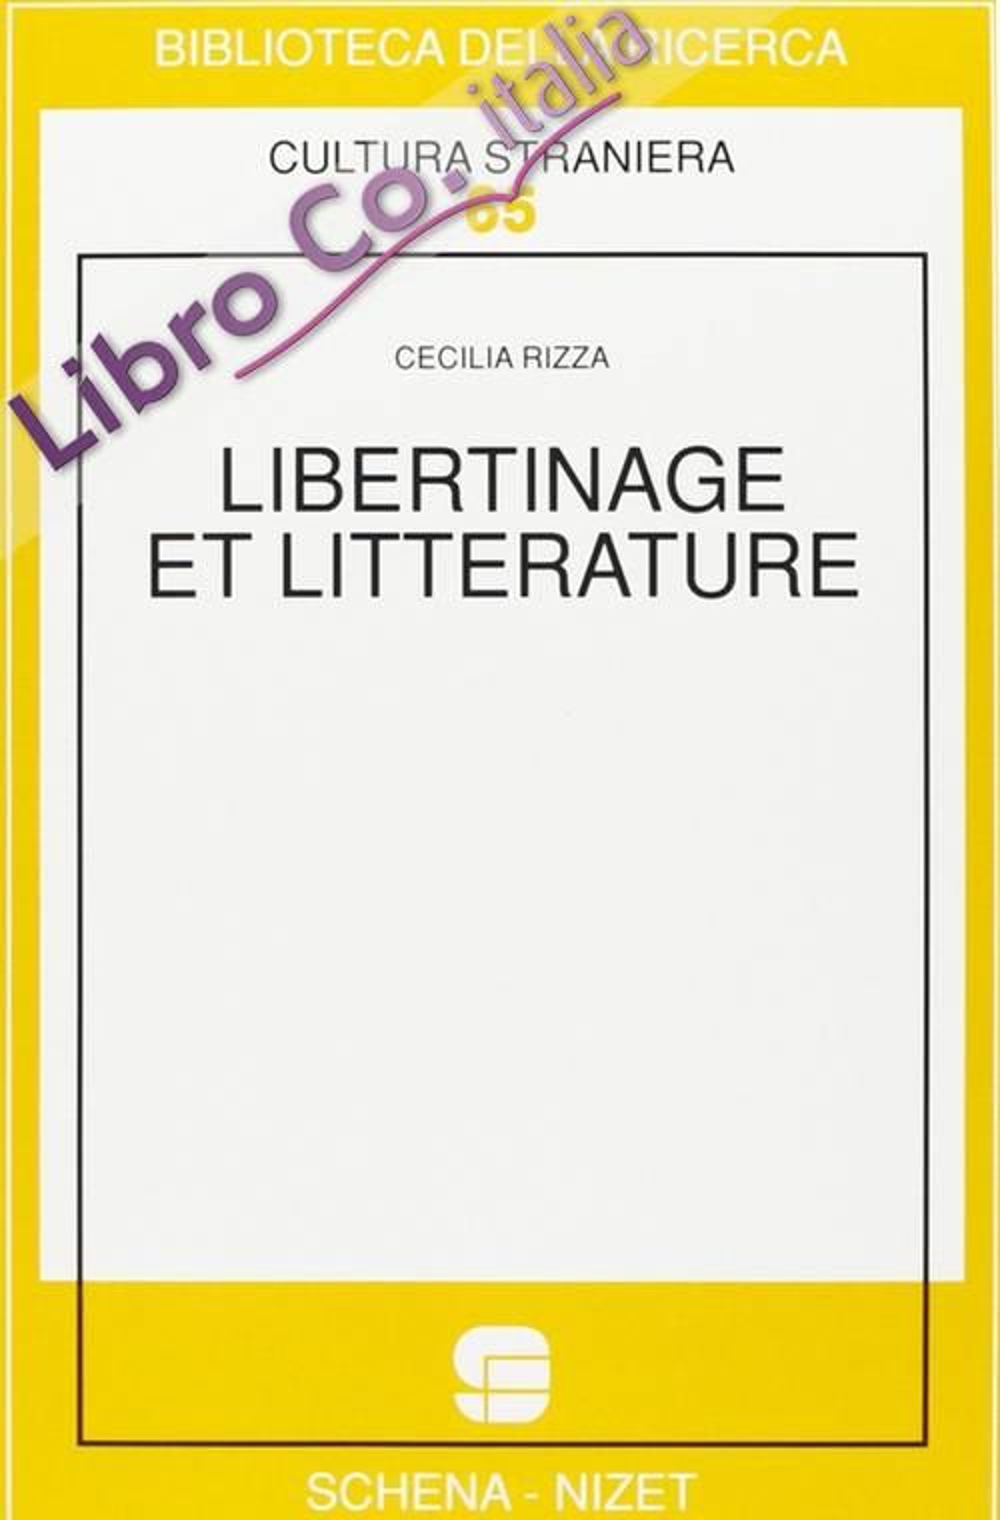 Libertinage et littérature